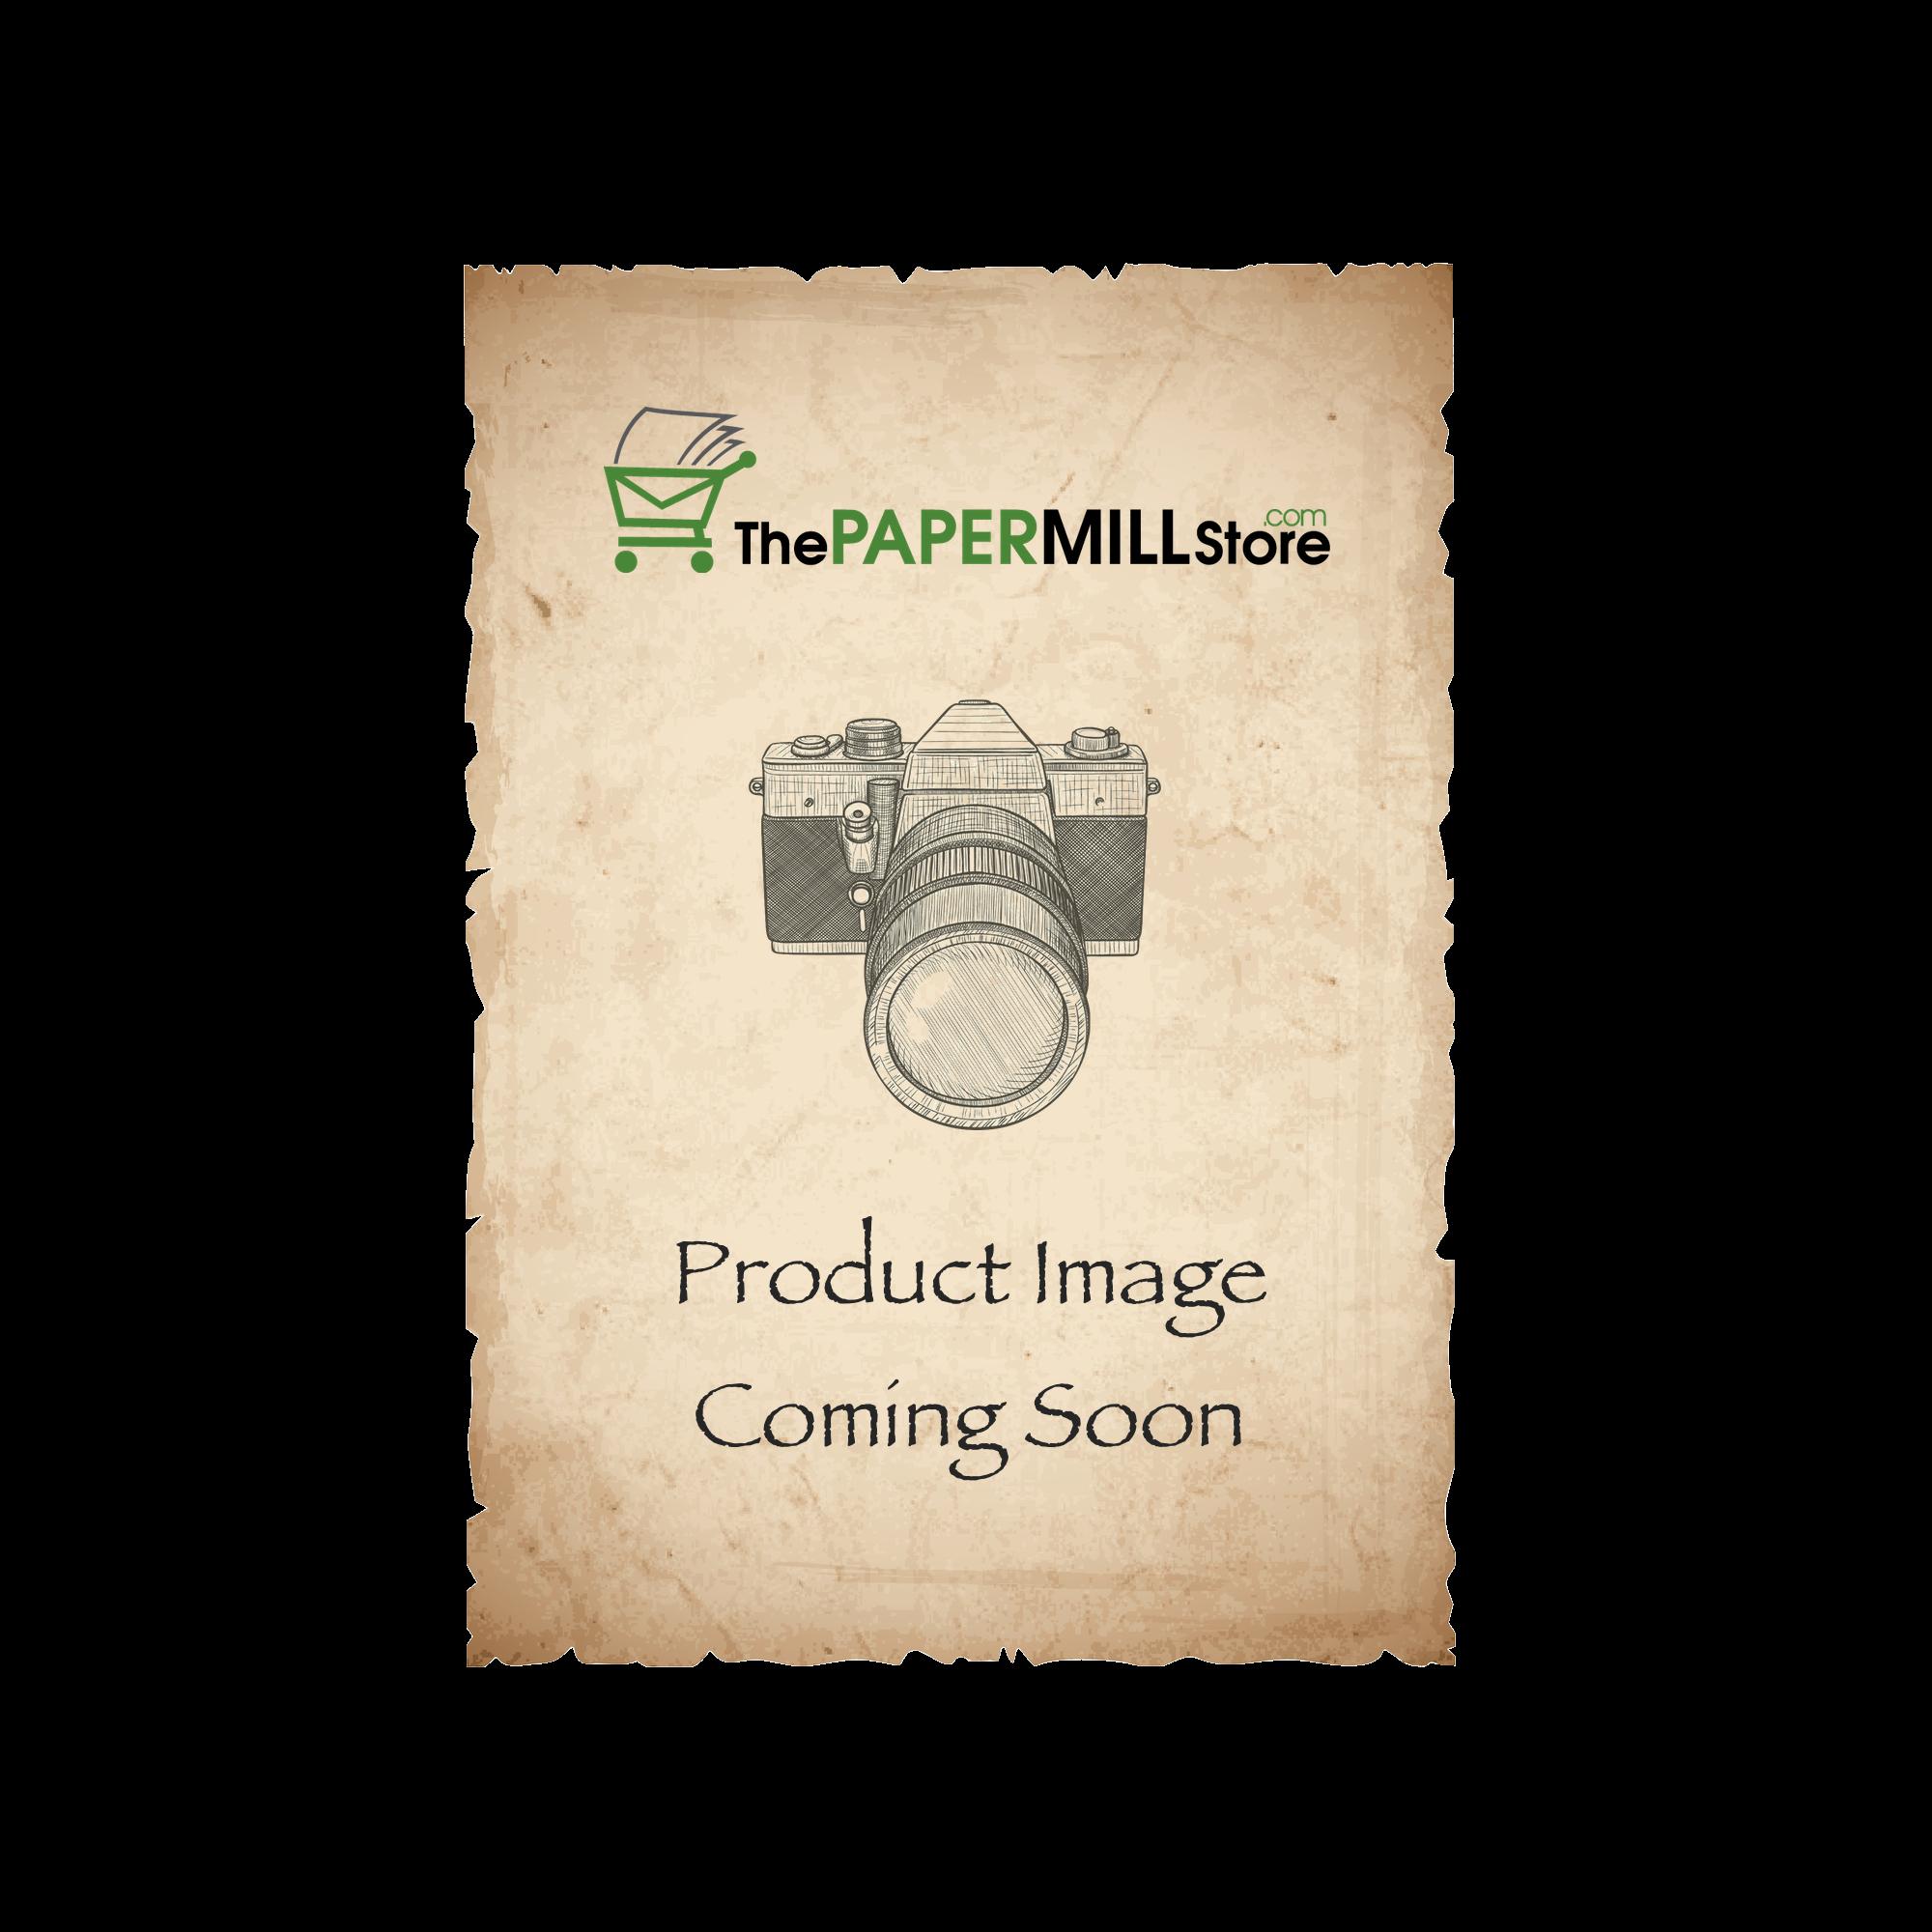 Kraft Brown/Grey Paper - 8 1/2 x 11 in 68 lb Text Fiber 25 per Package